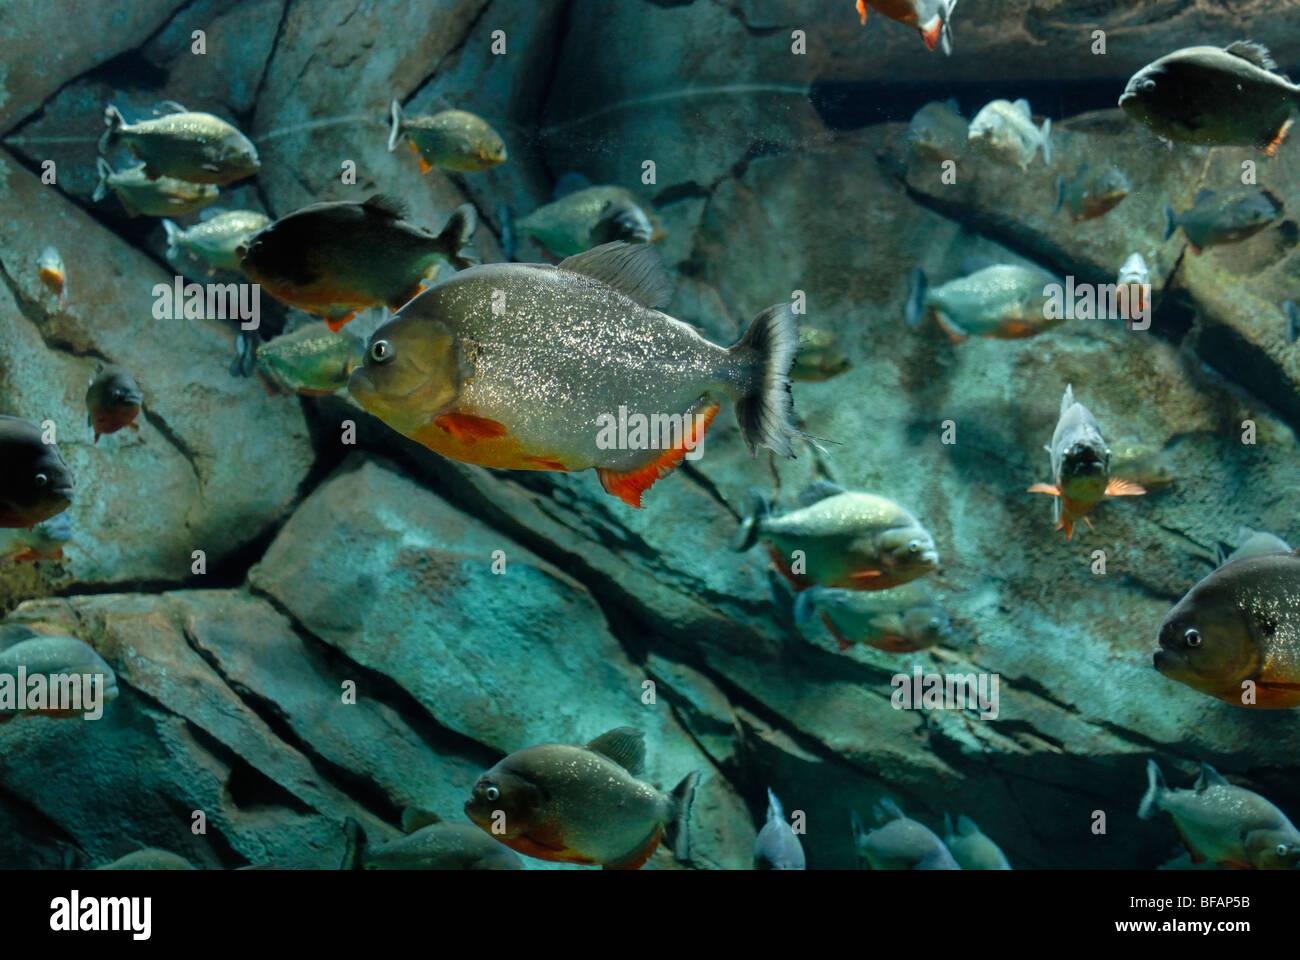 Red piranha exhibit pygocentrus nattereri georgia for Piranha fish tank